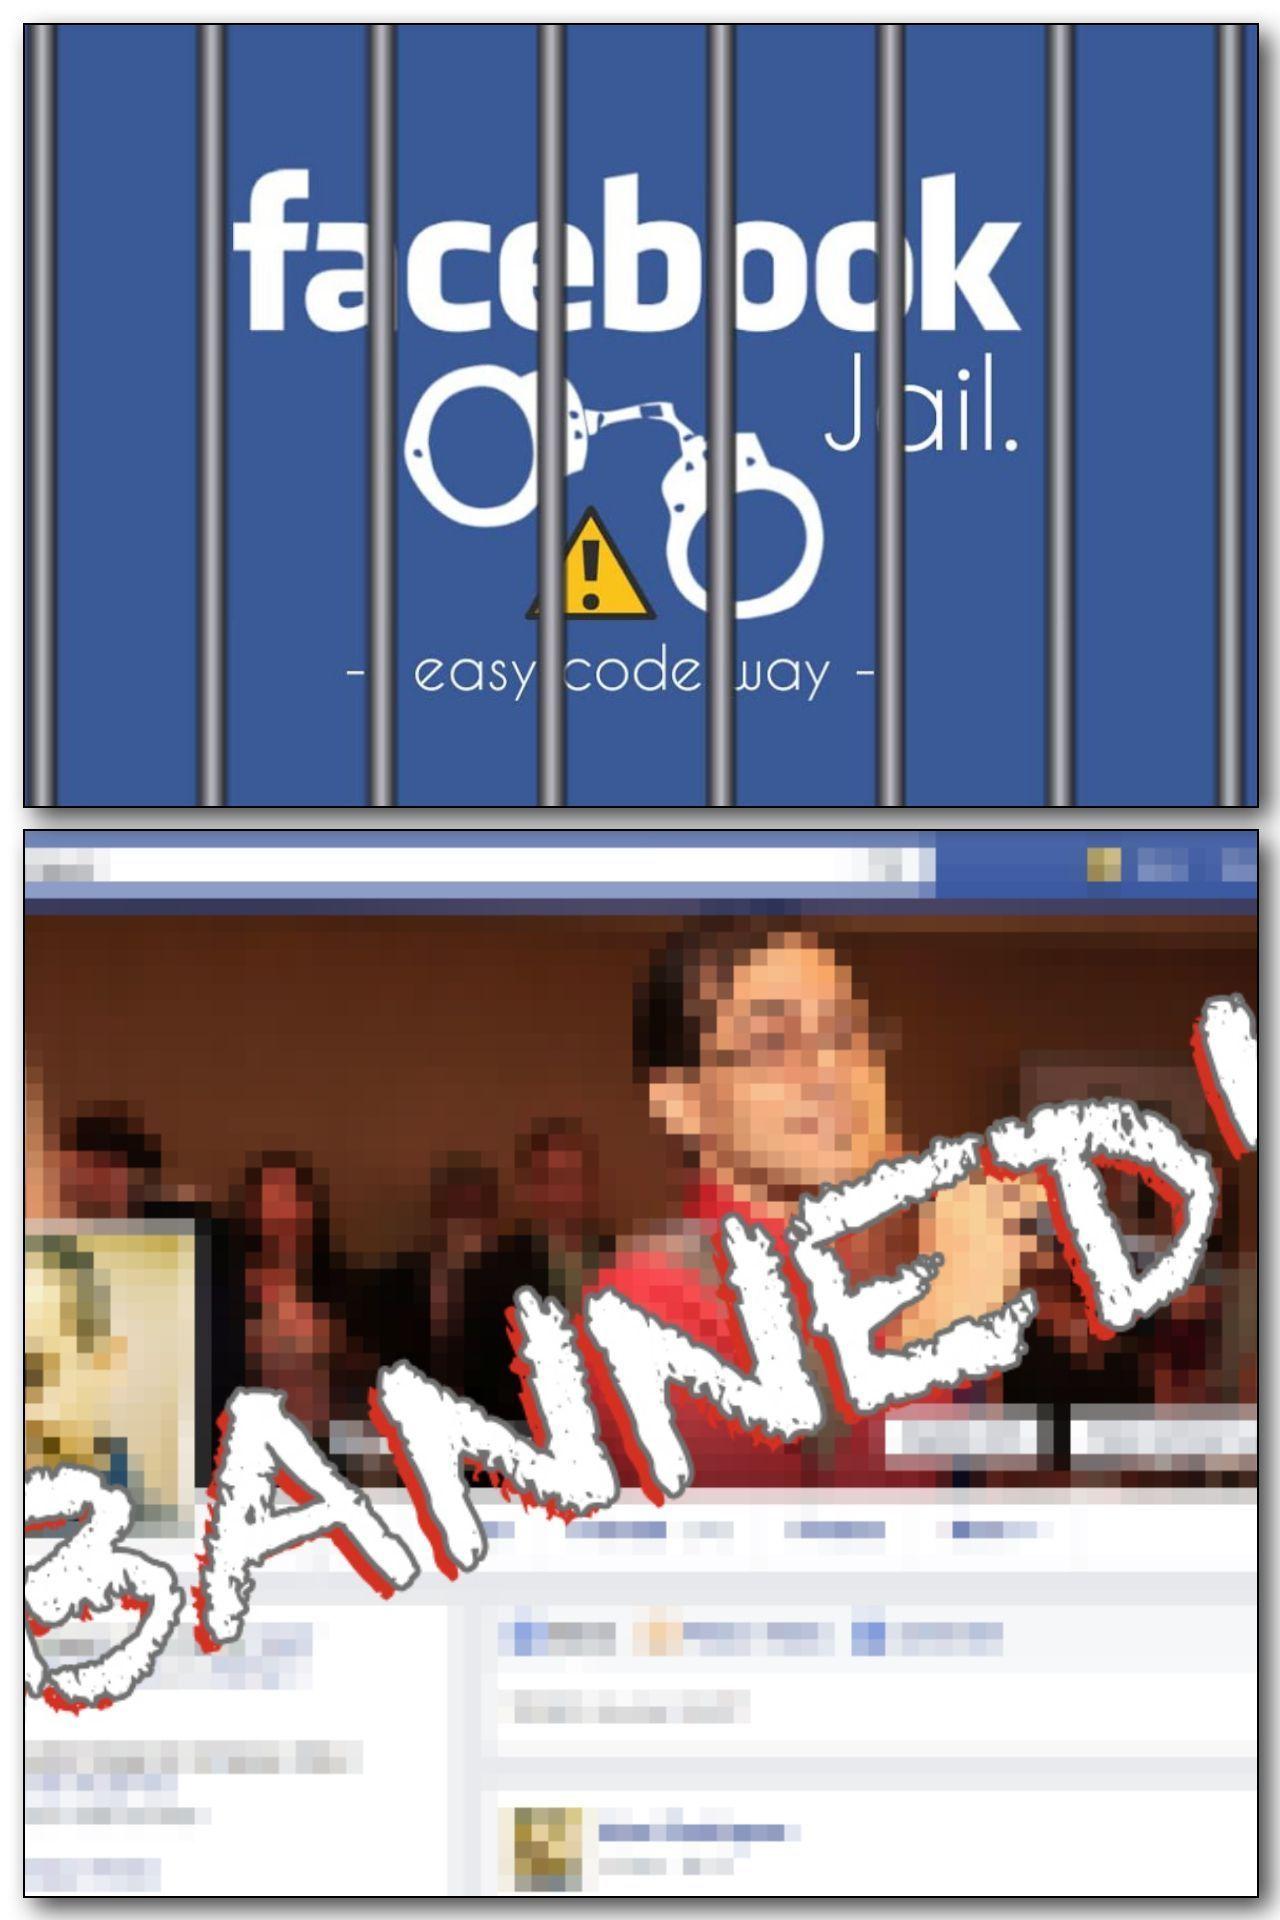 73704d57cfcb102d715309ab6e694135 - Will Netflix Ban You For Using Vpn